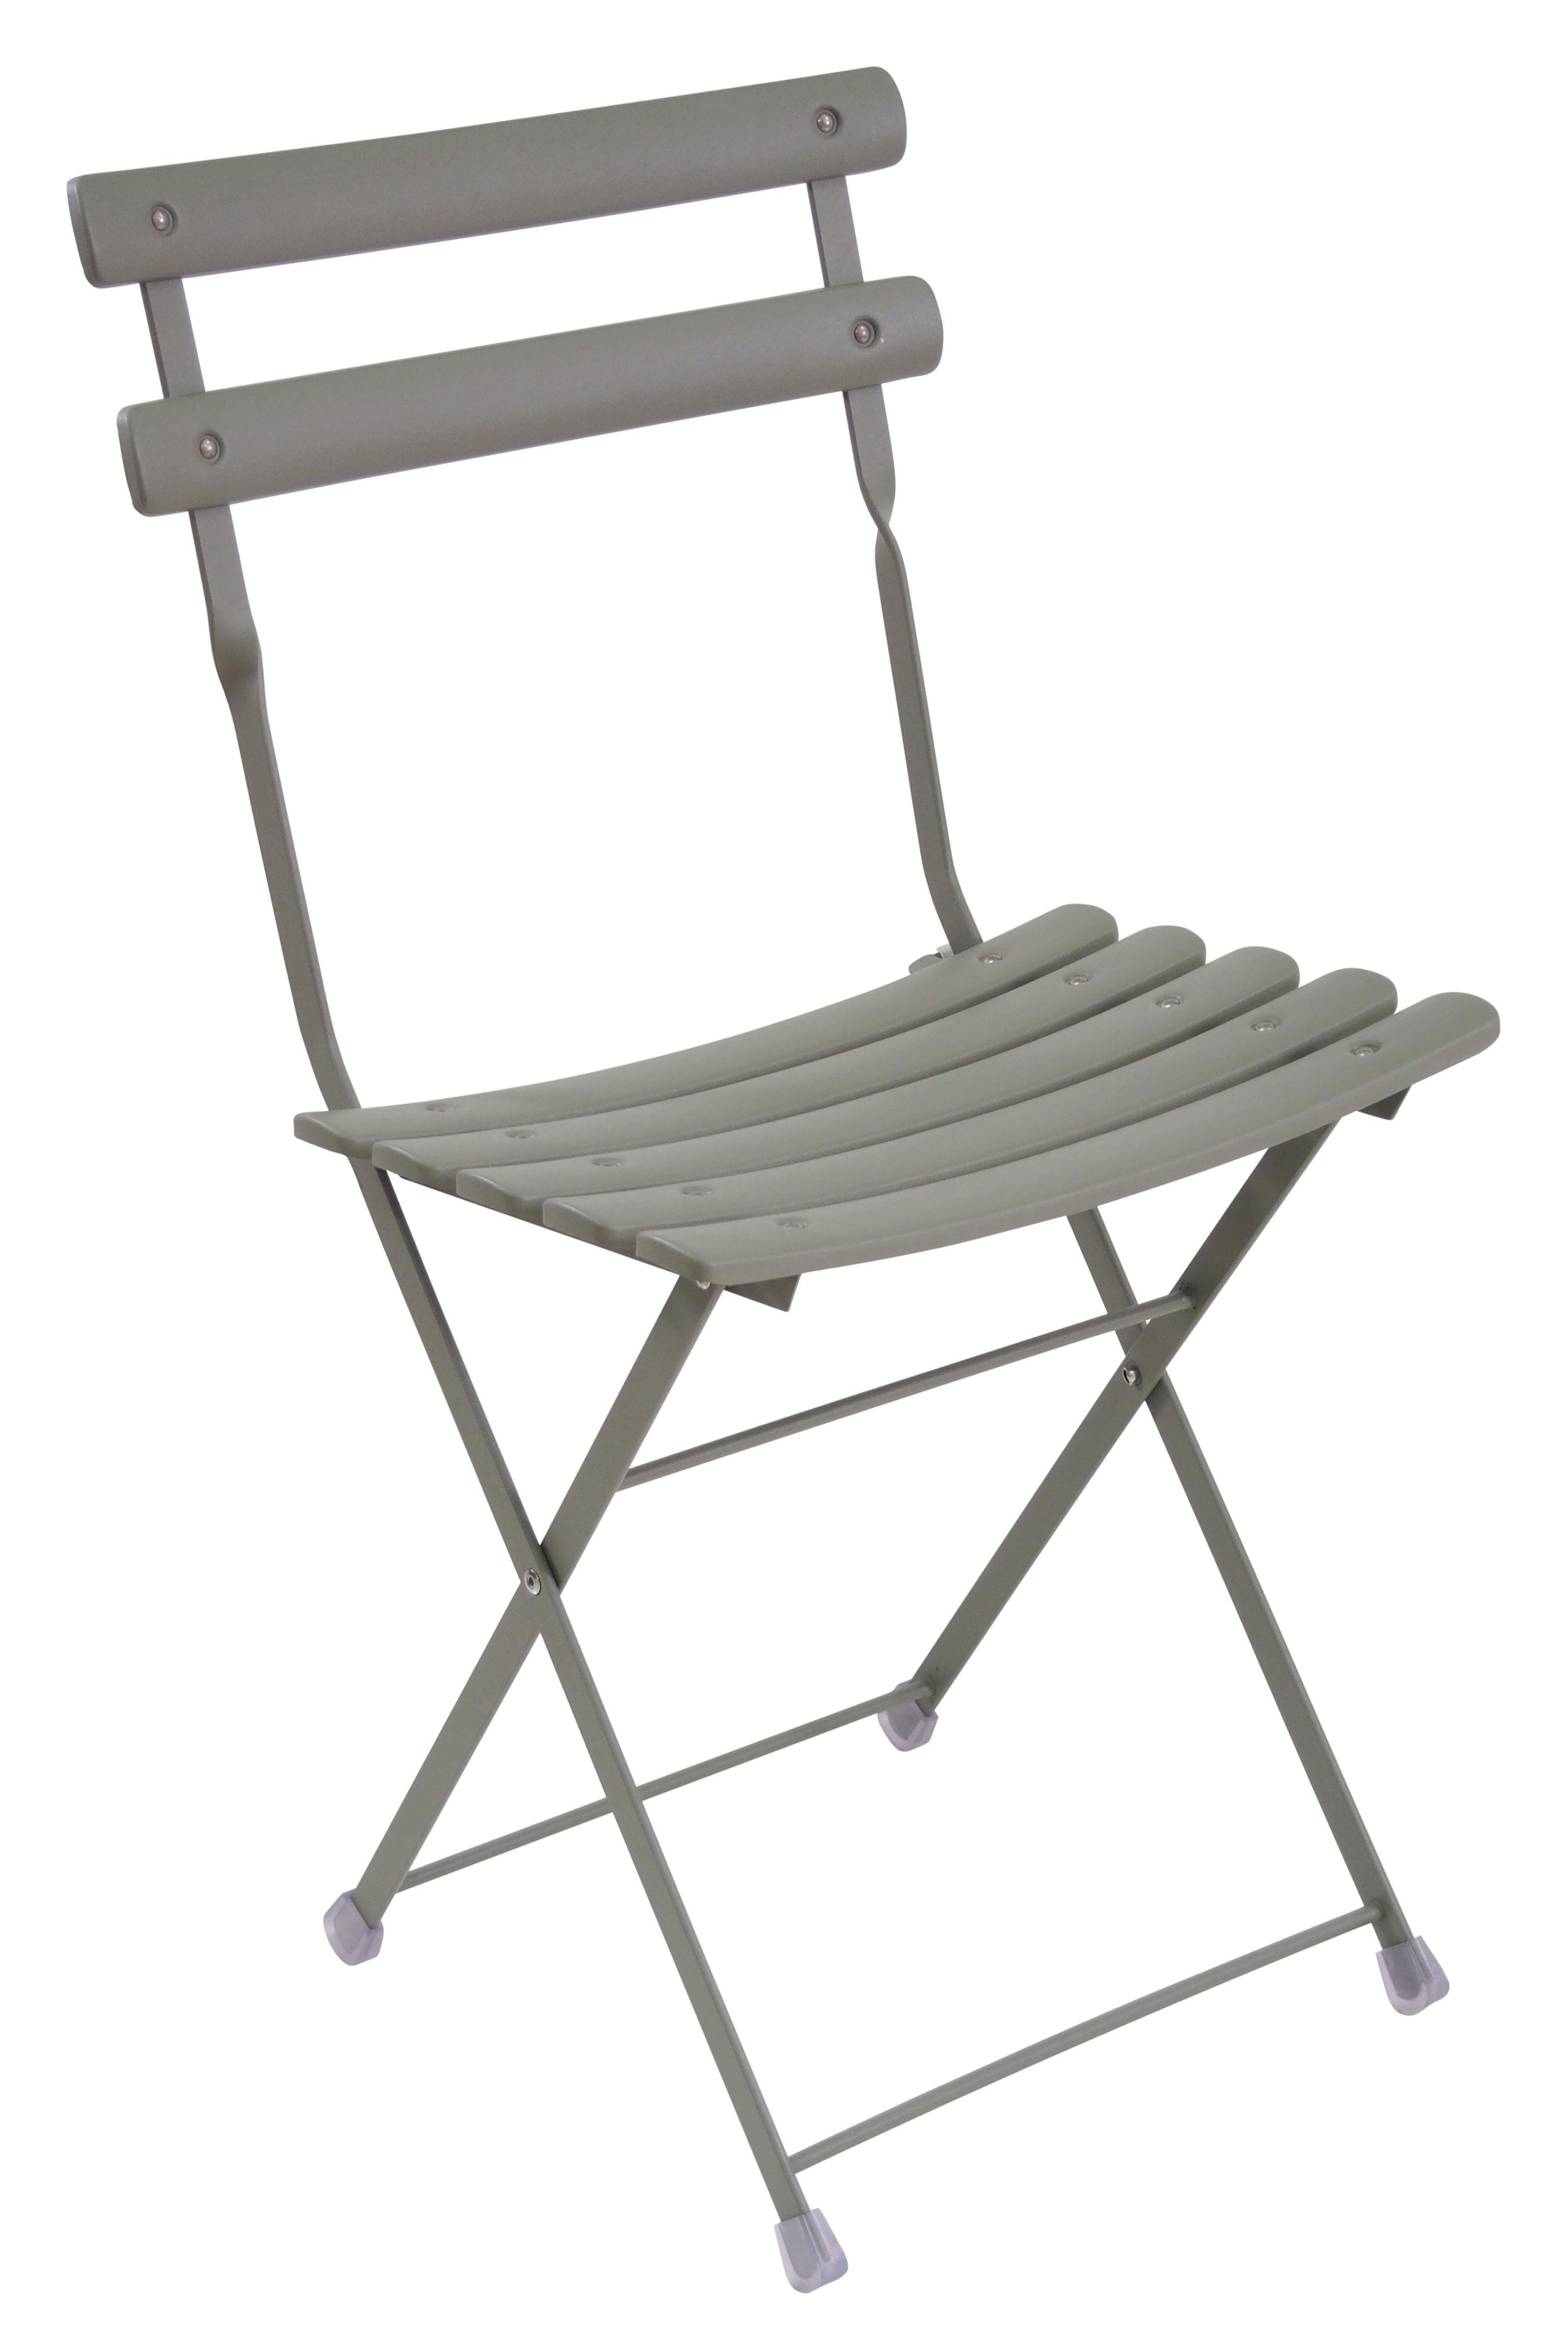 Furniture - Chairs - Arc en Ciel Folding chair - Metal by Emu - Grey - Varnished steel